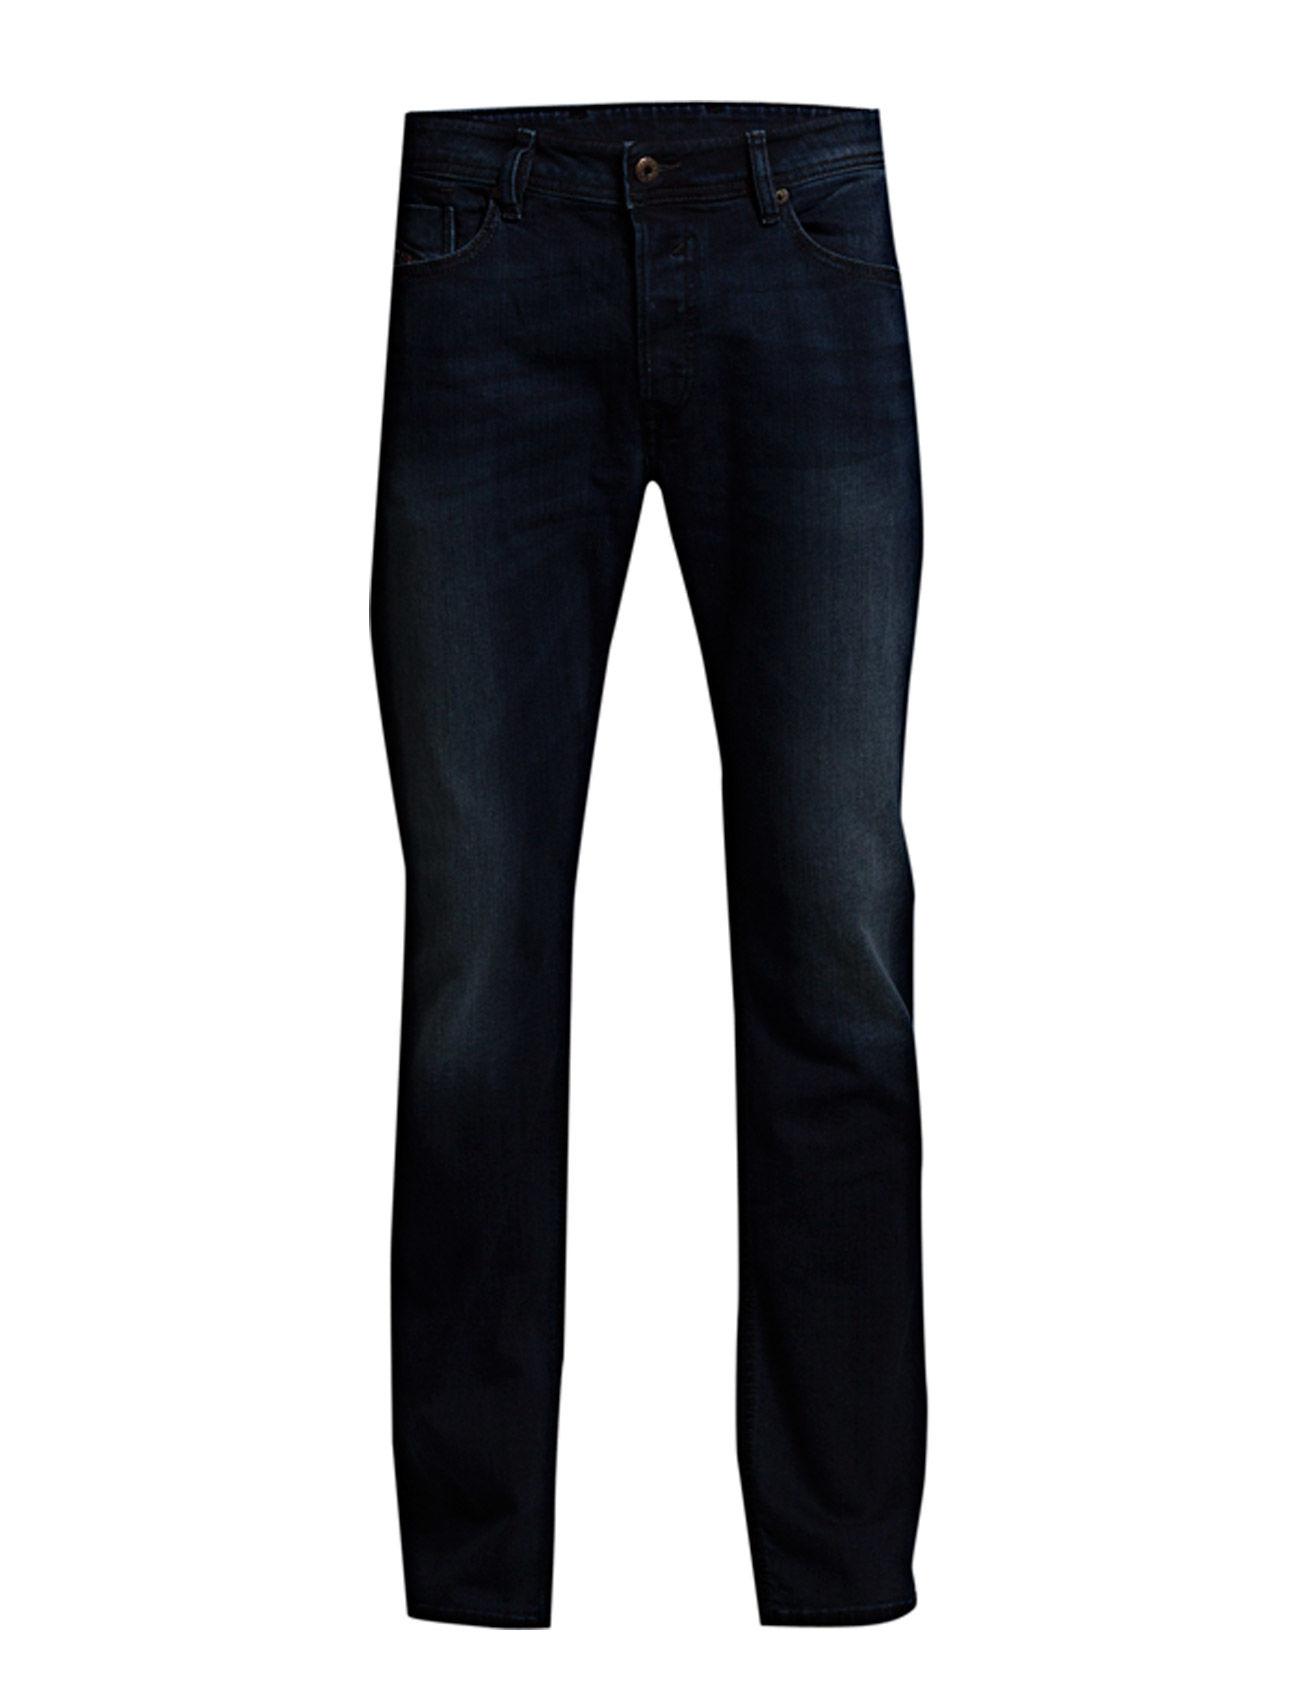 Waykee L.32 Trousers